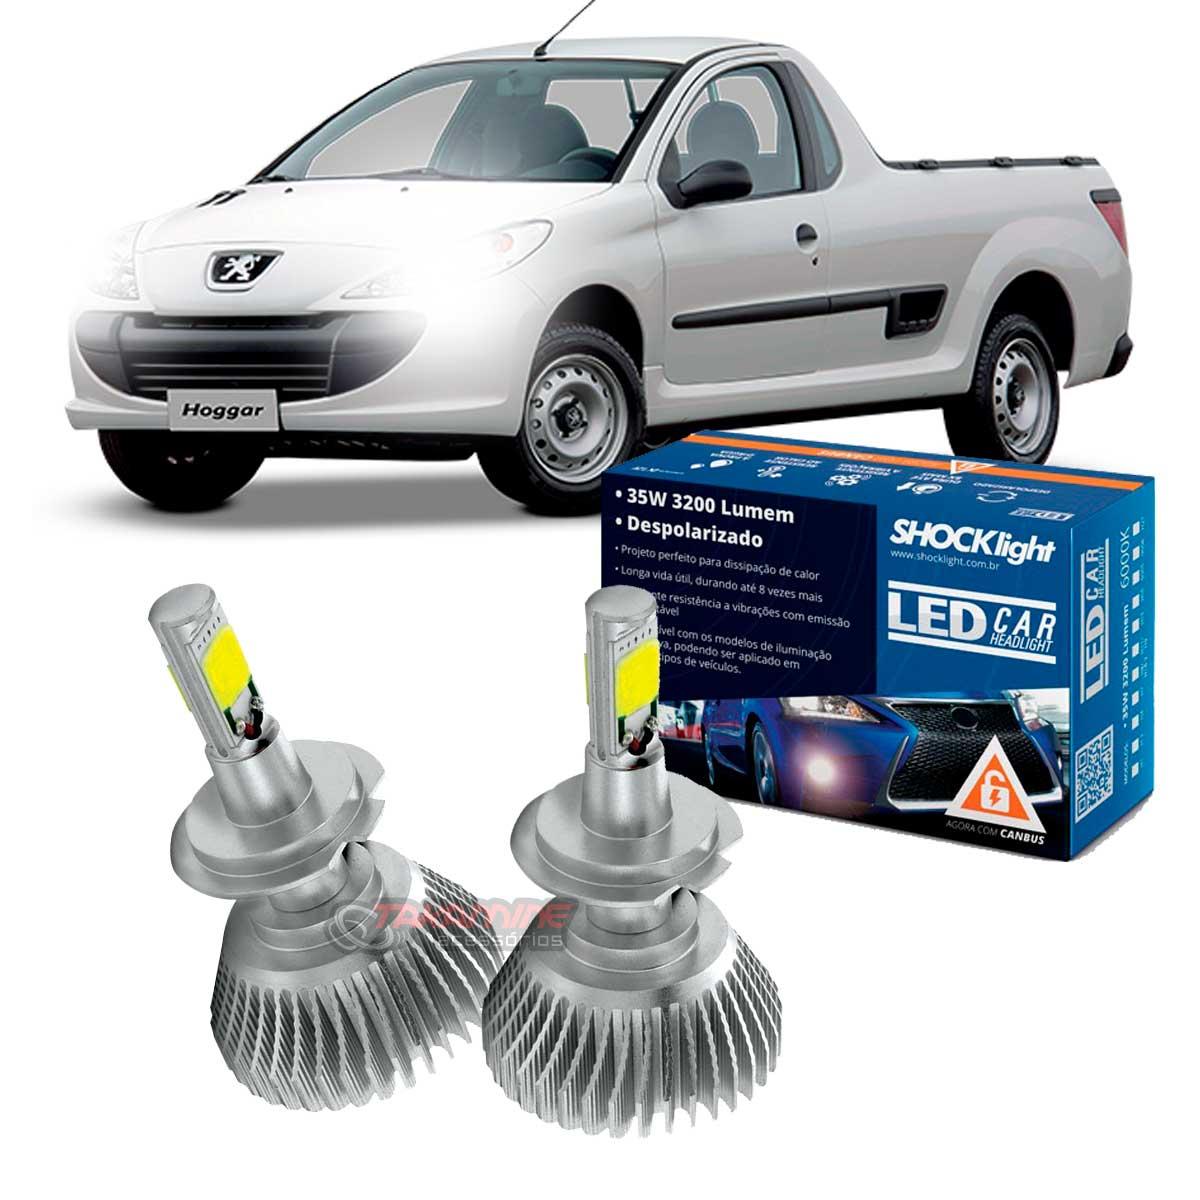 Kit LED Peugeot Hoggar 2010 2011 2012 2013 tipo xenon farol baixo H7 35W Headlight